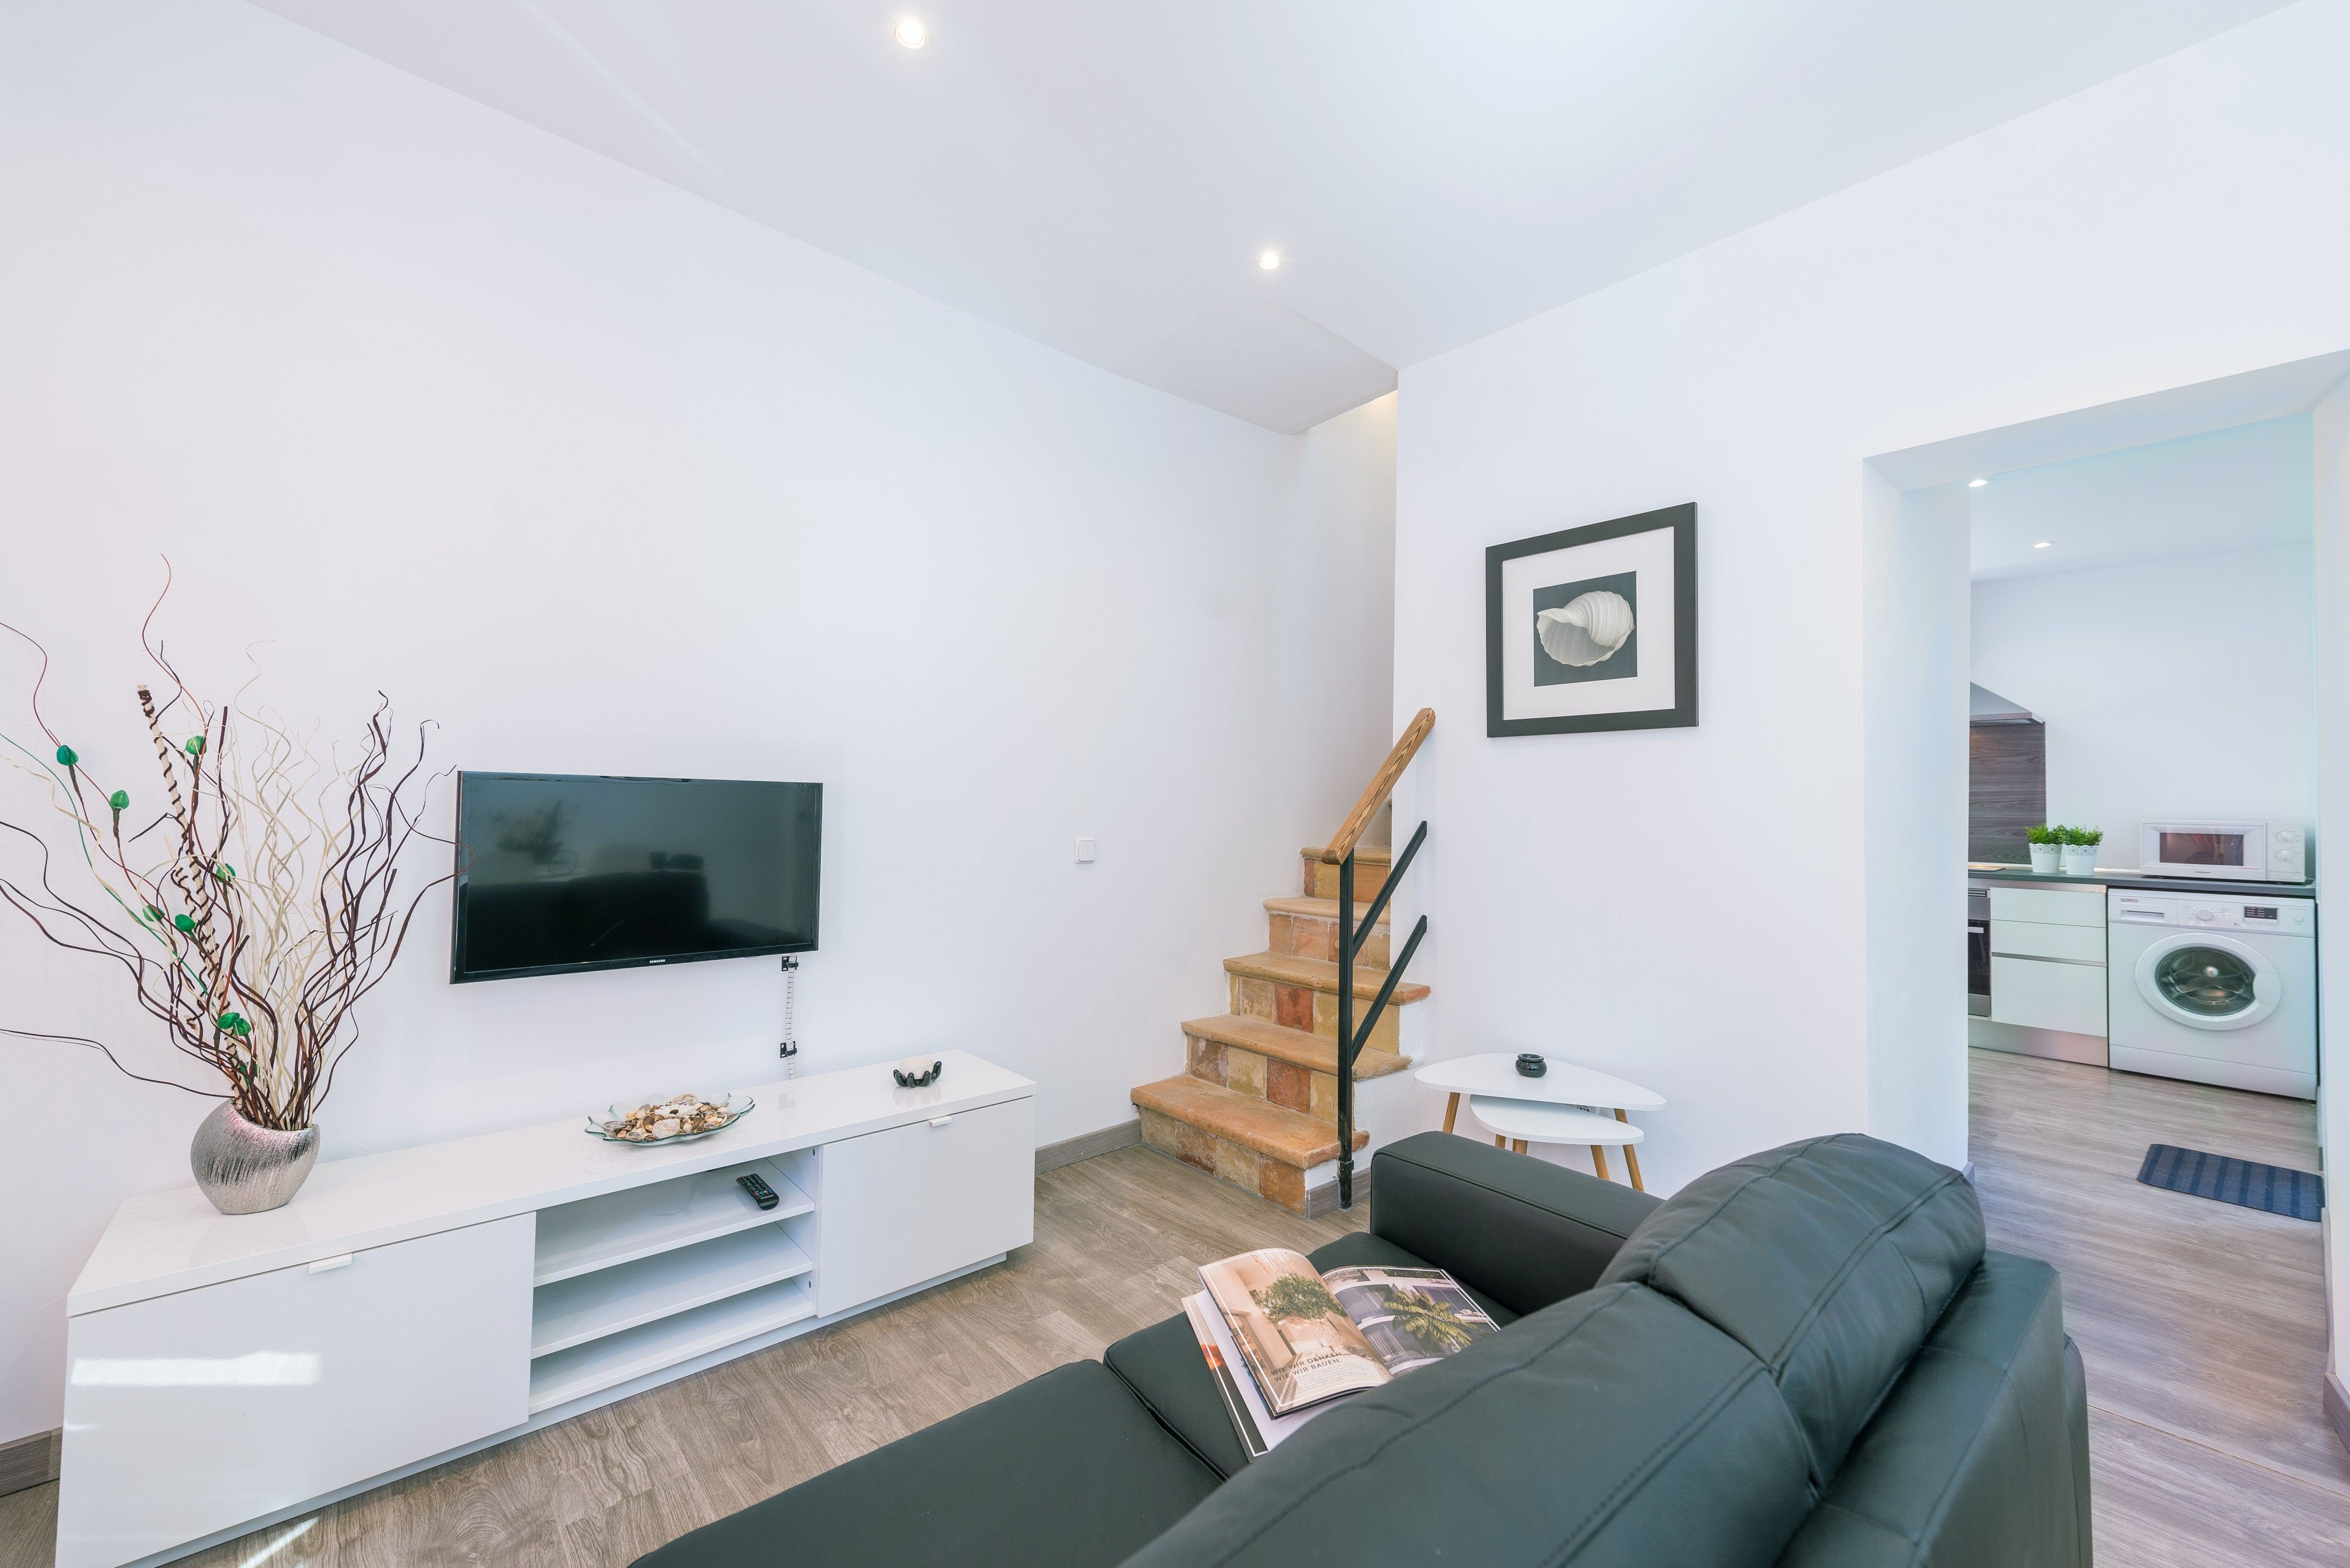 Apartamento en Port d'andratx con wi-fi